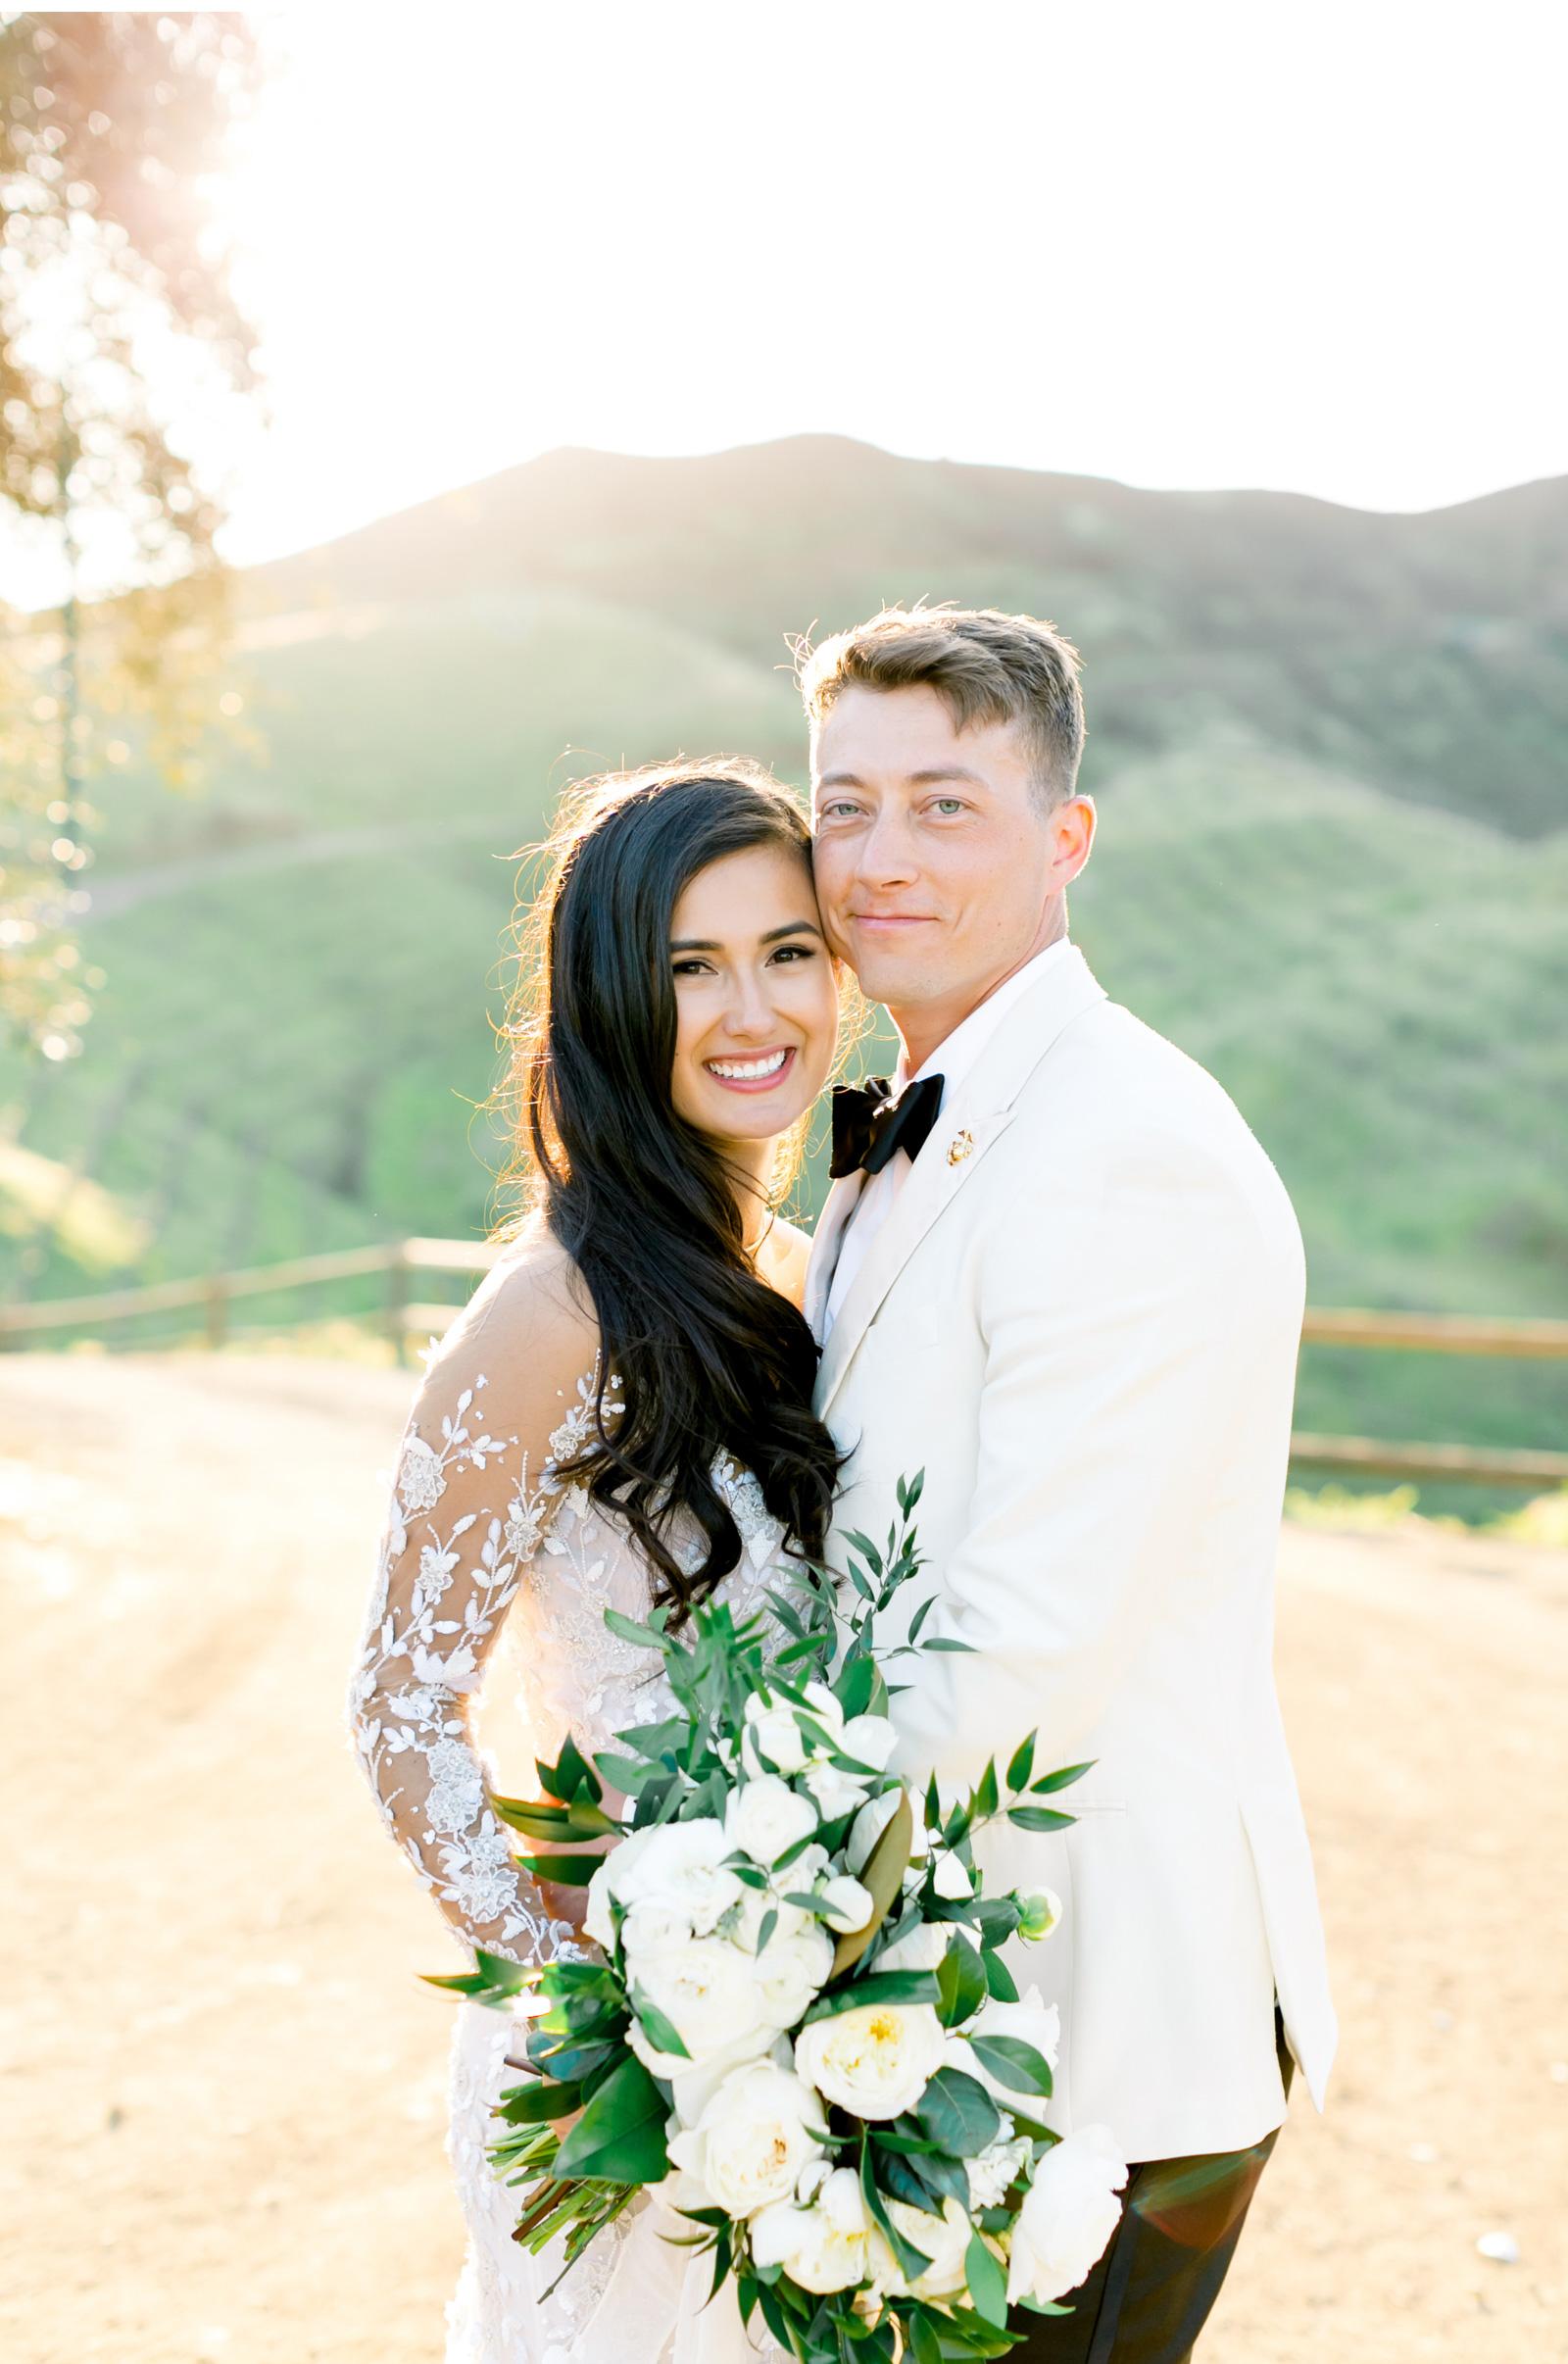 Style-Me-Pretty-Malibu-Wedding-Venues-Southern-California-Wedding-Photographer-Triunfo-Creek-Malibu-Photographer-Natalie-Schutt-Photography_05.jpg